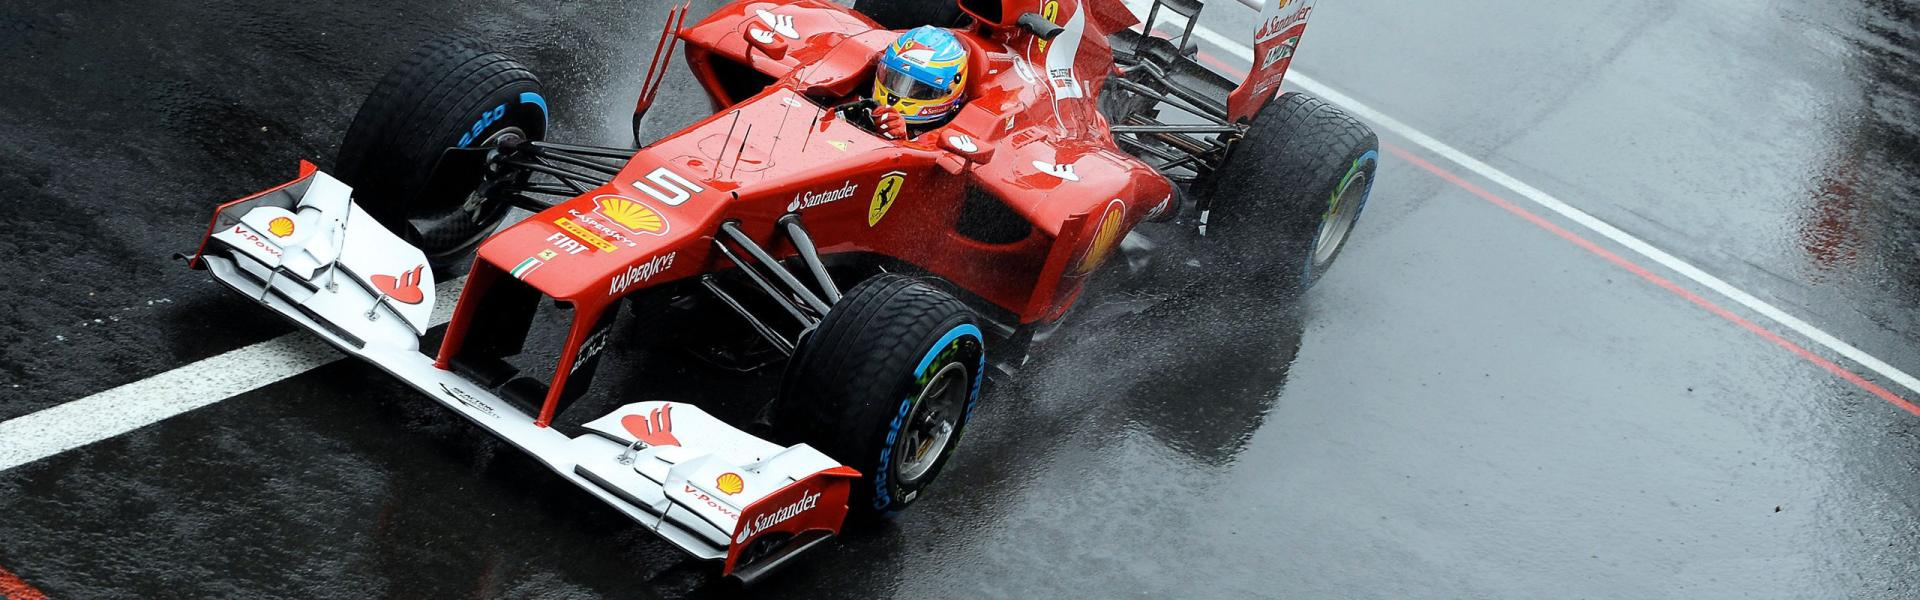 Wallpaper Ferrari